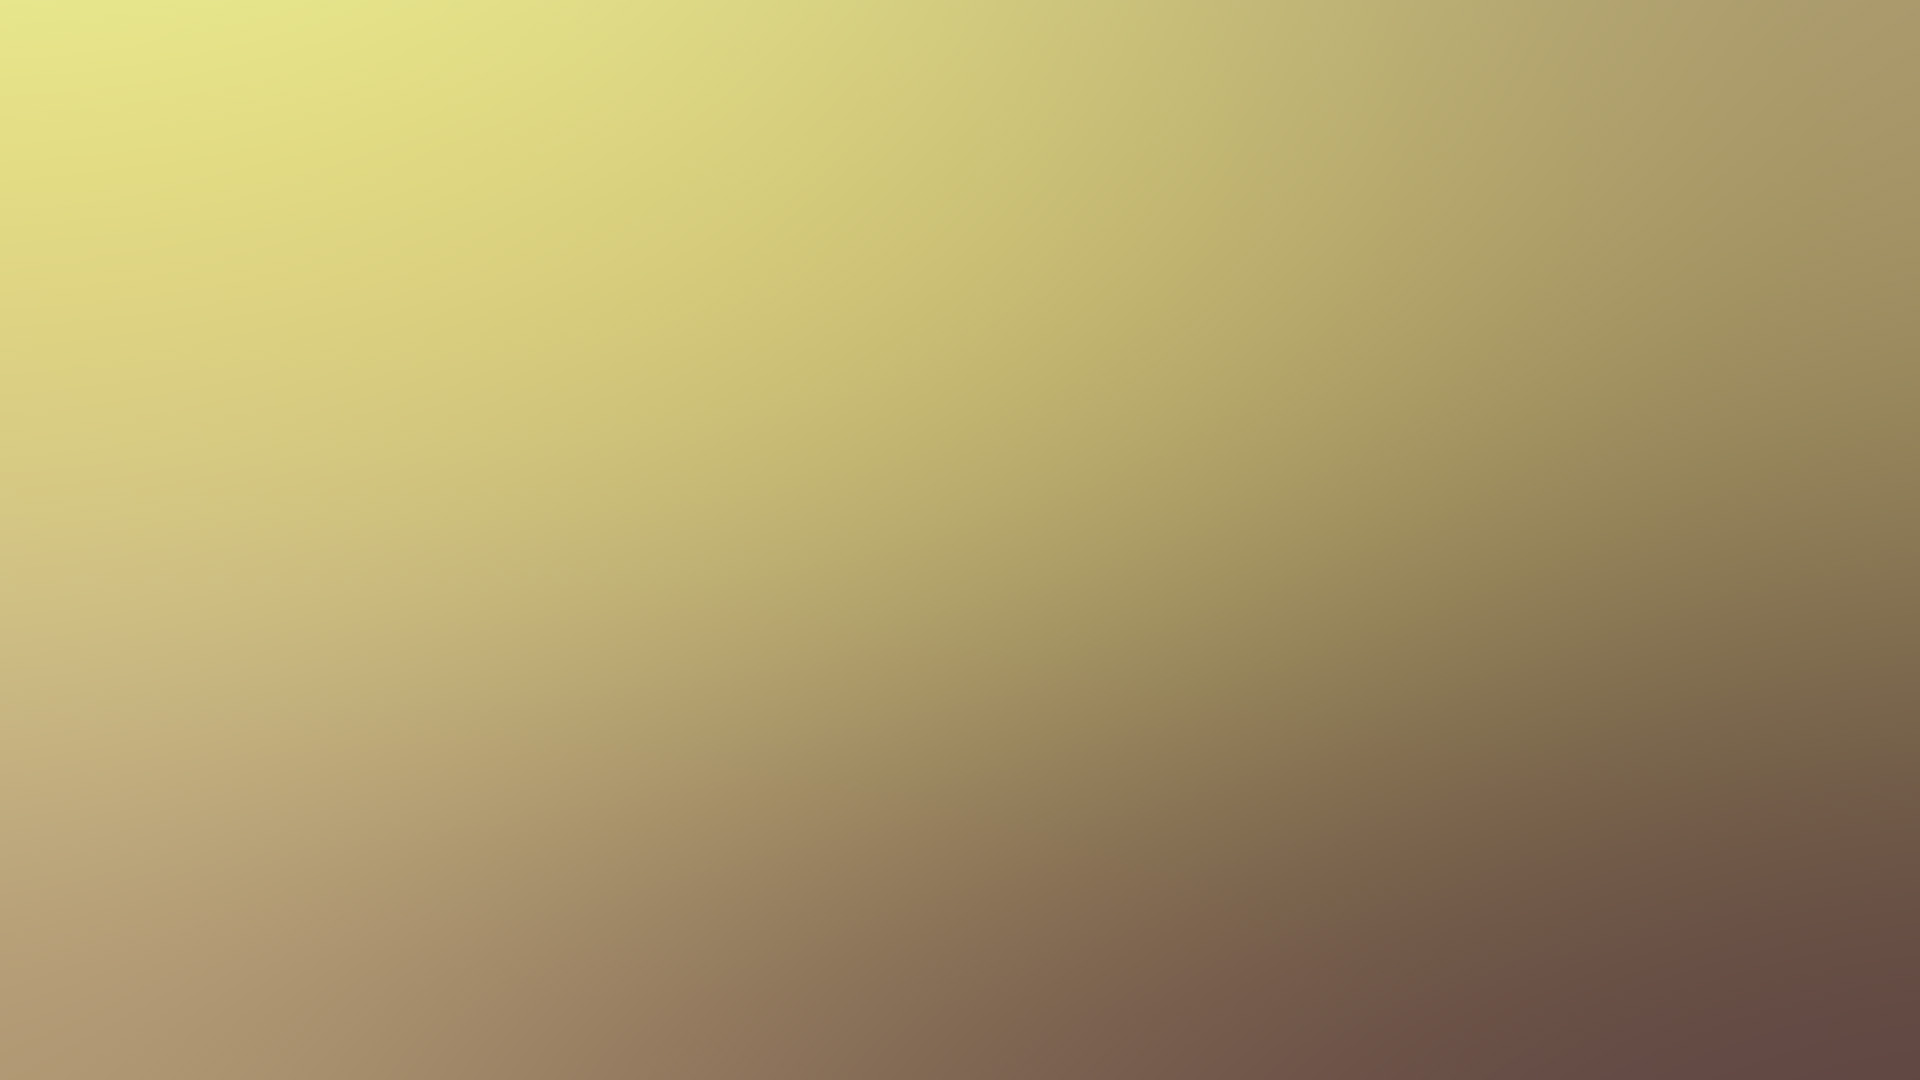 Fall Textured Wallpaper Sj67 Soft Orange Brown Night Gradation Blur Wallpaper